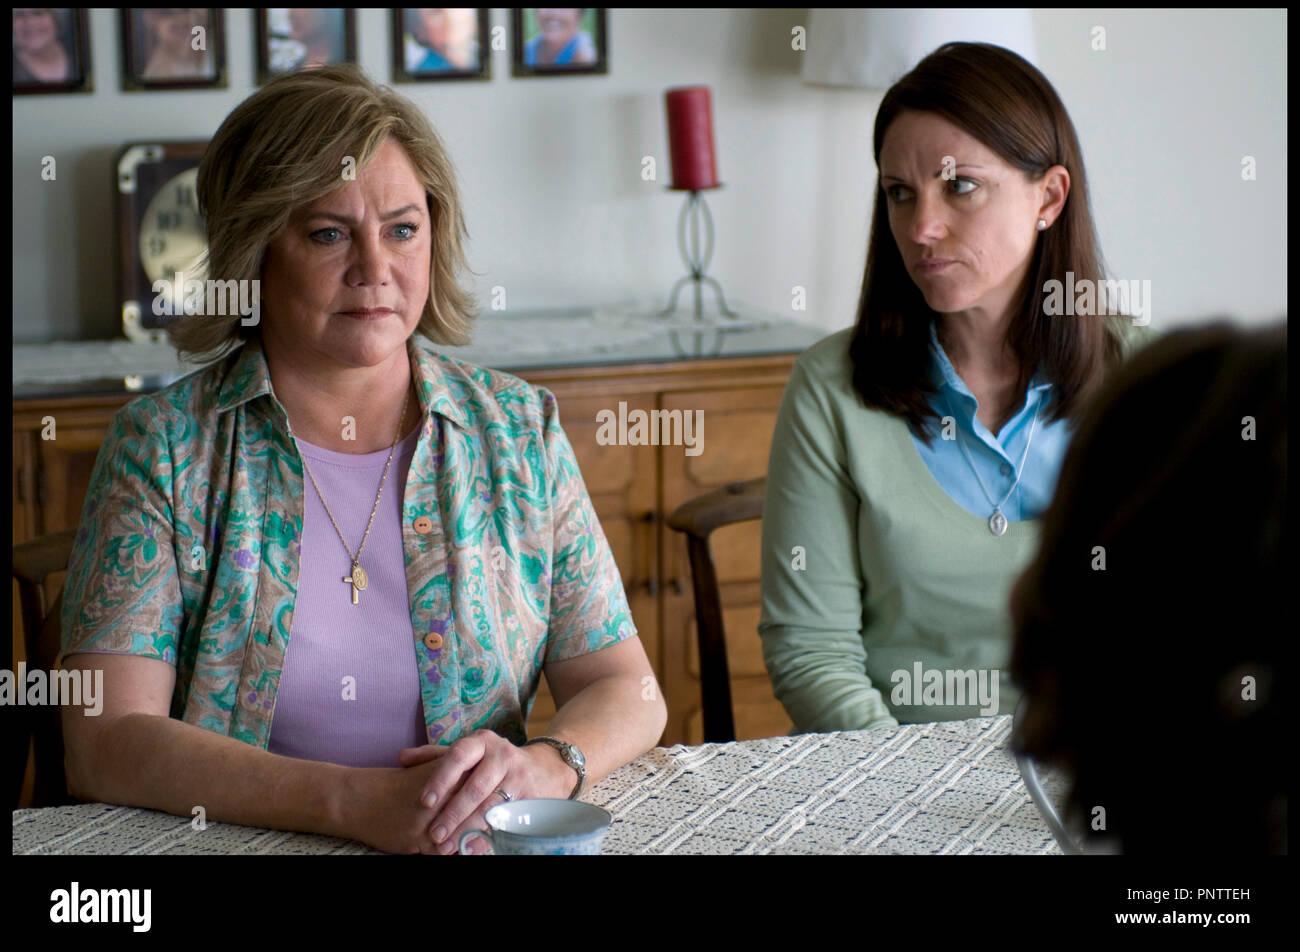 Prod DB © certeza Films - Presentar imágenes / DR la perfecta familia de Anne Renton 2011 USA avec Kathleen Turner Imagen De Stock